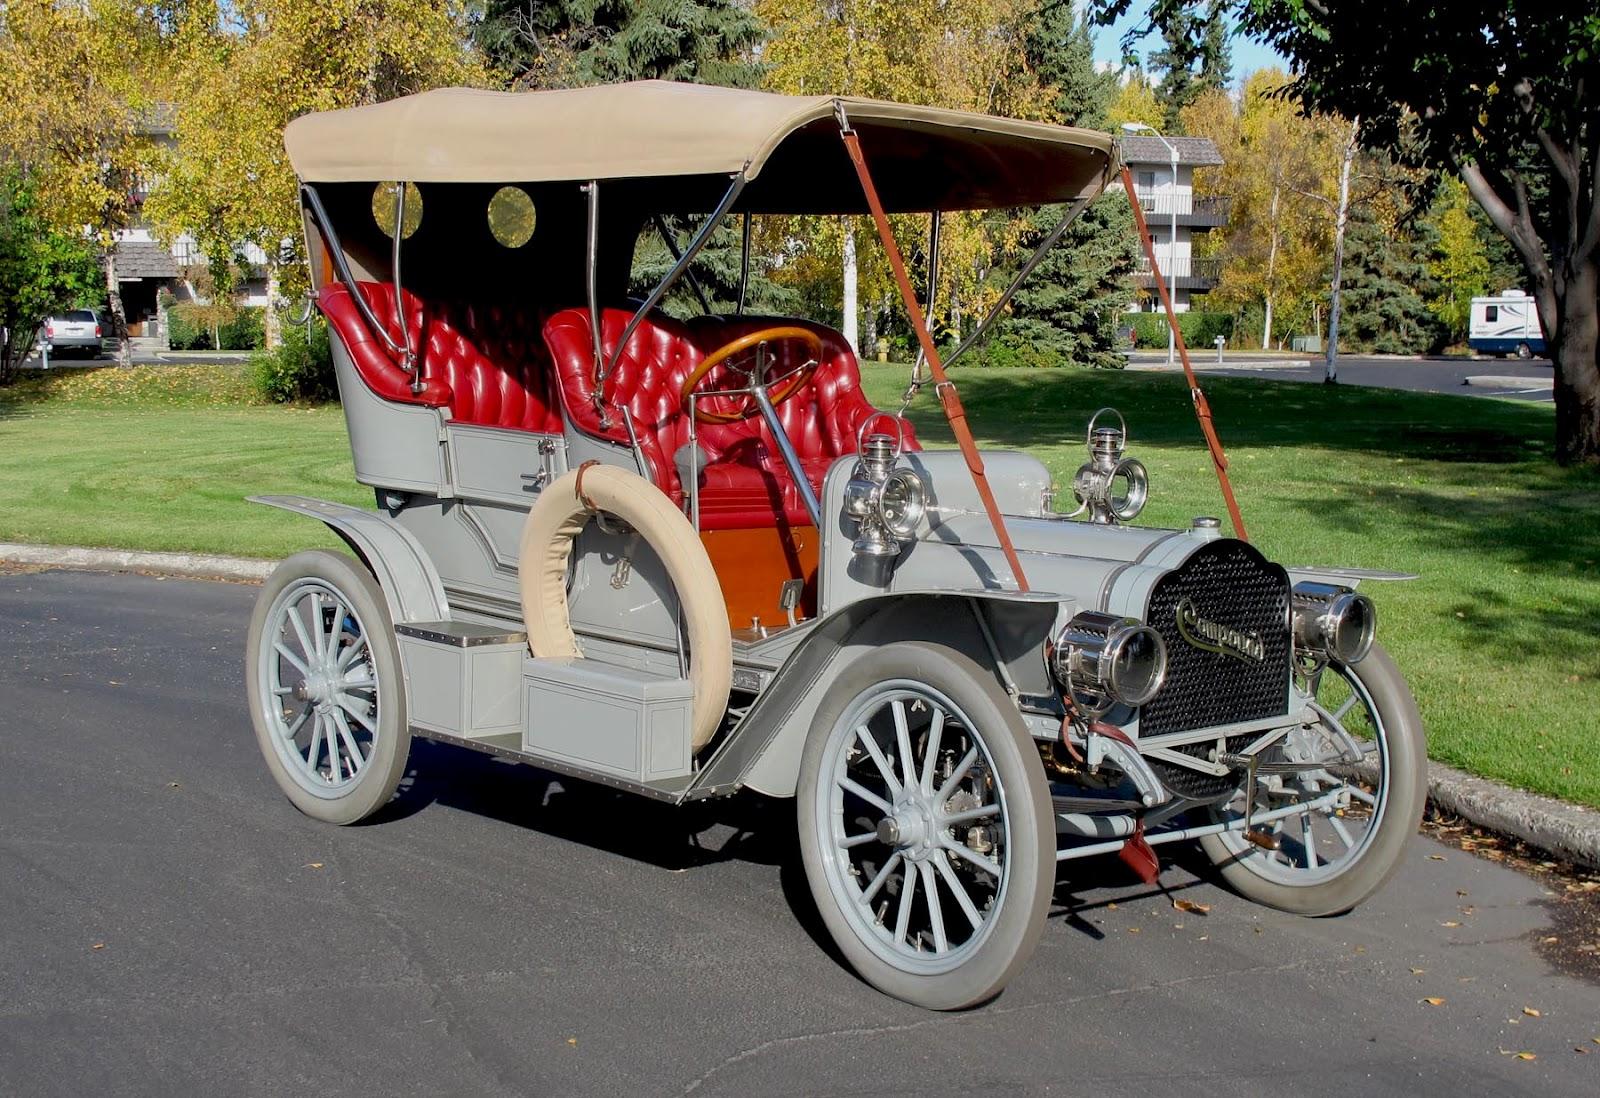 Fountainhead Antique Auto Museum: The Unusual Compound ...